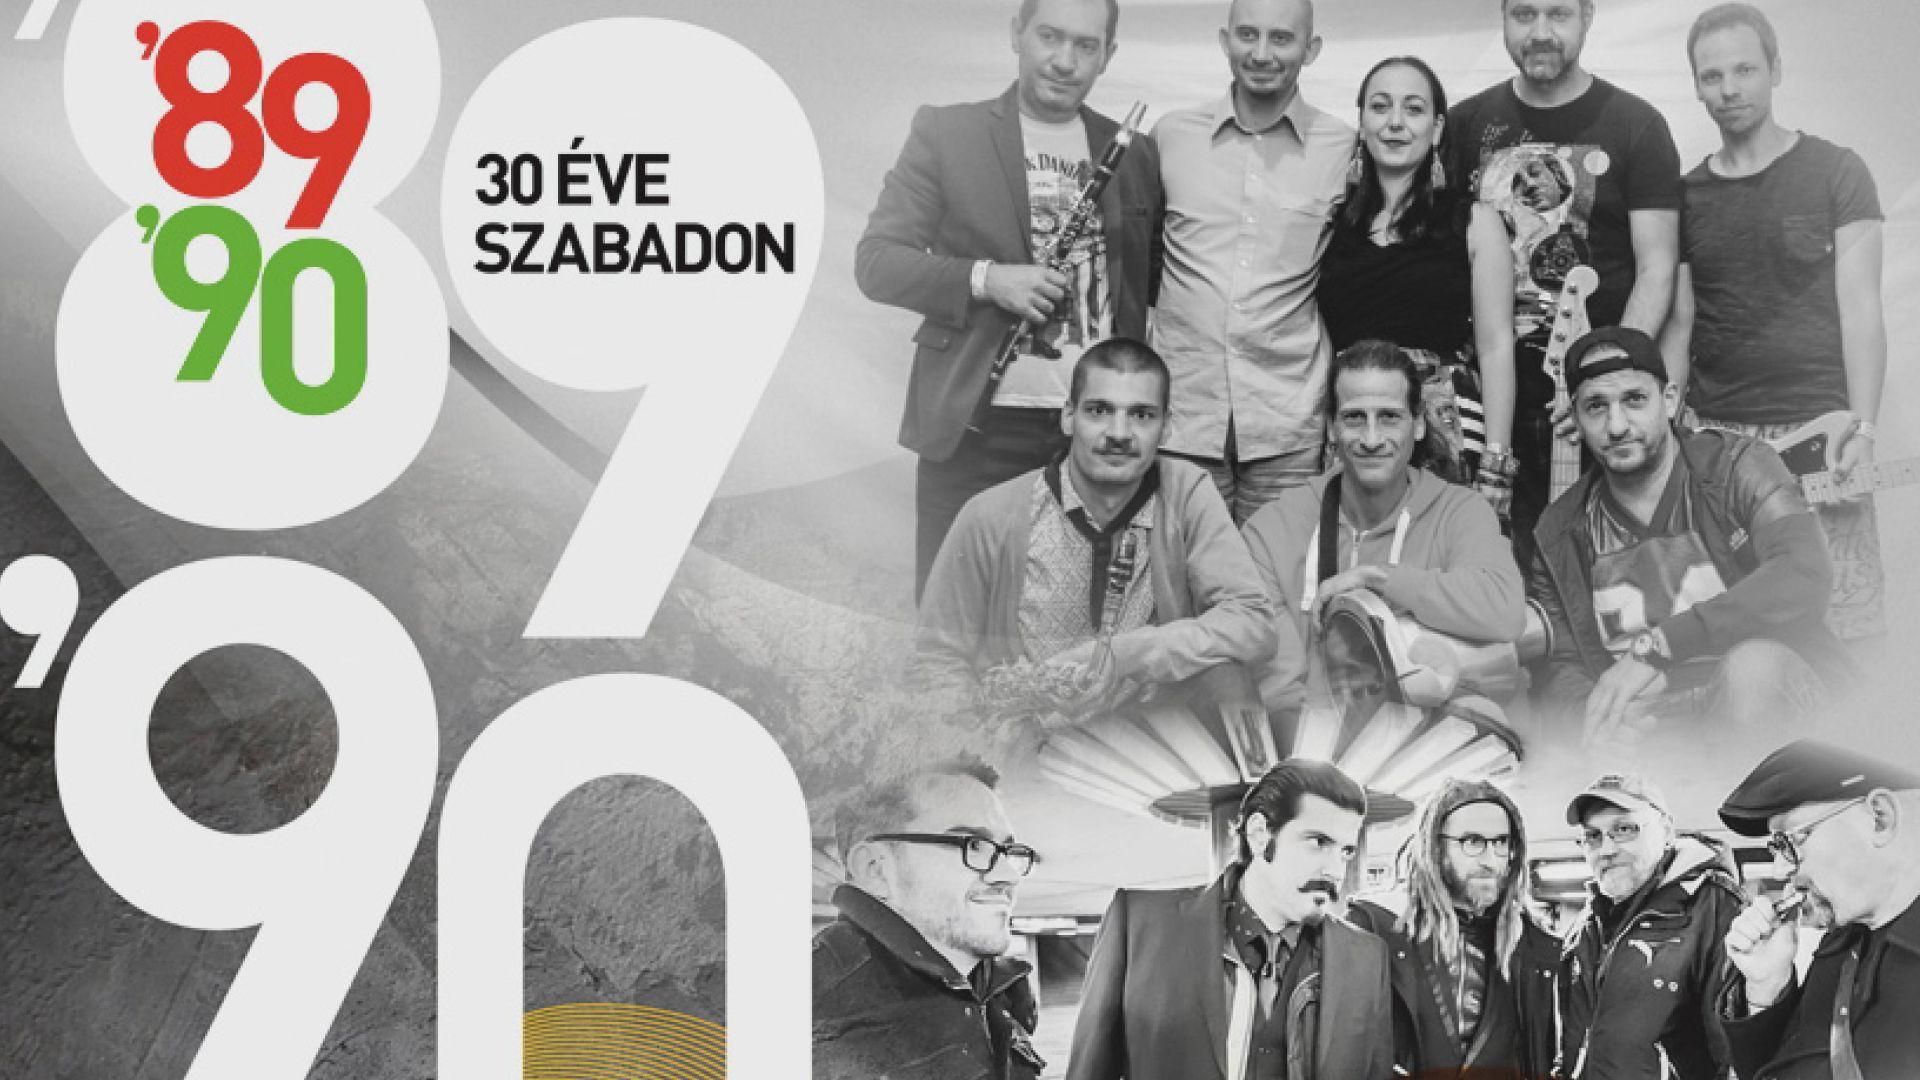 30 éve szabadon - Koncertek Balatonfüreden